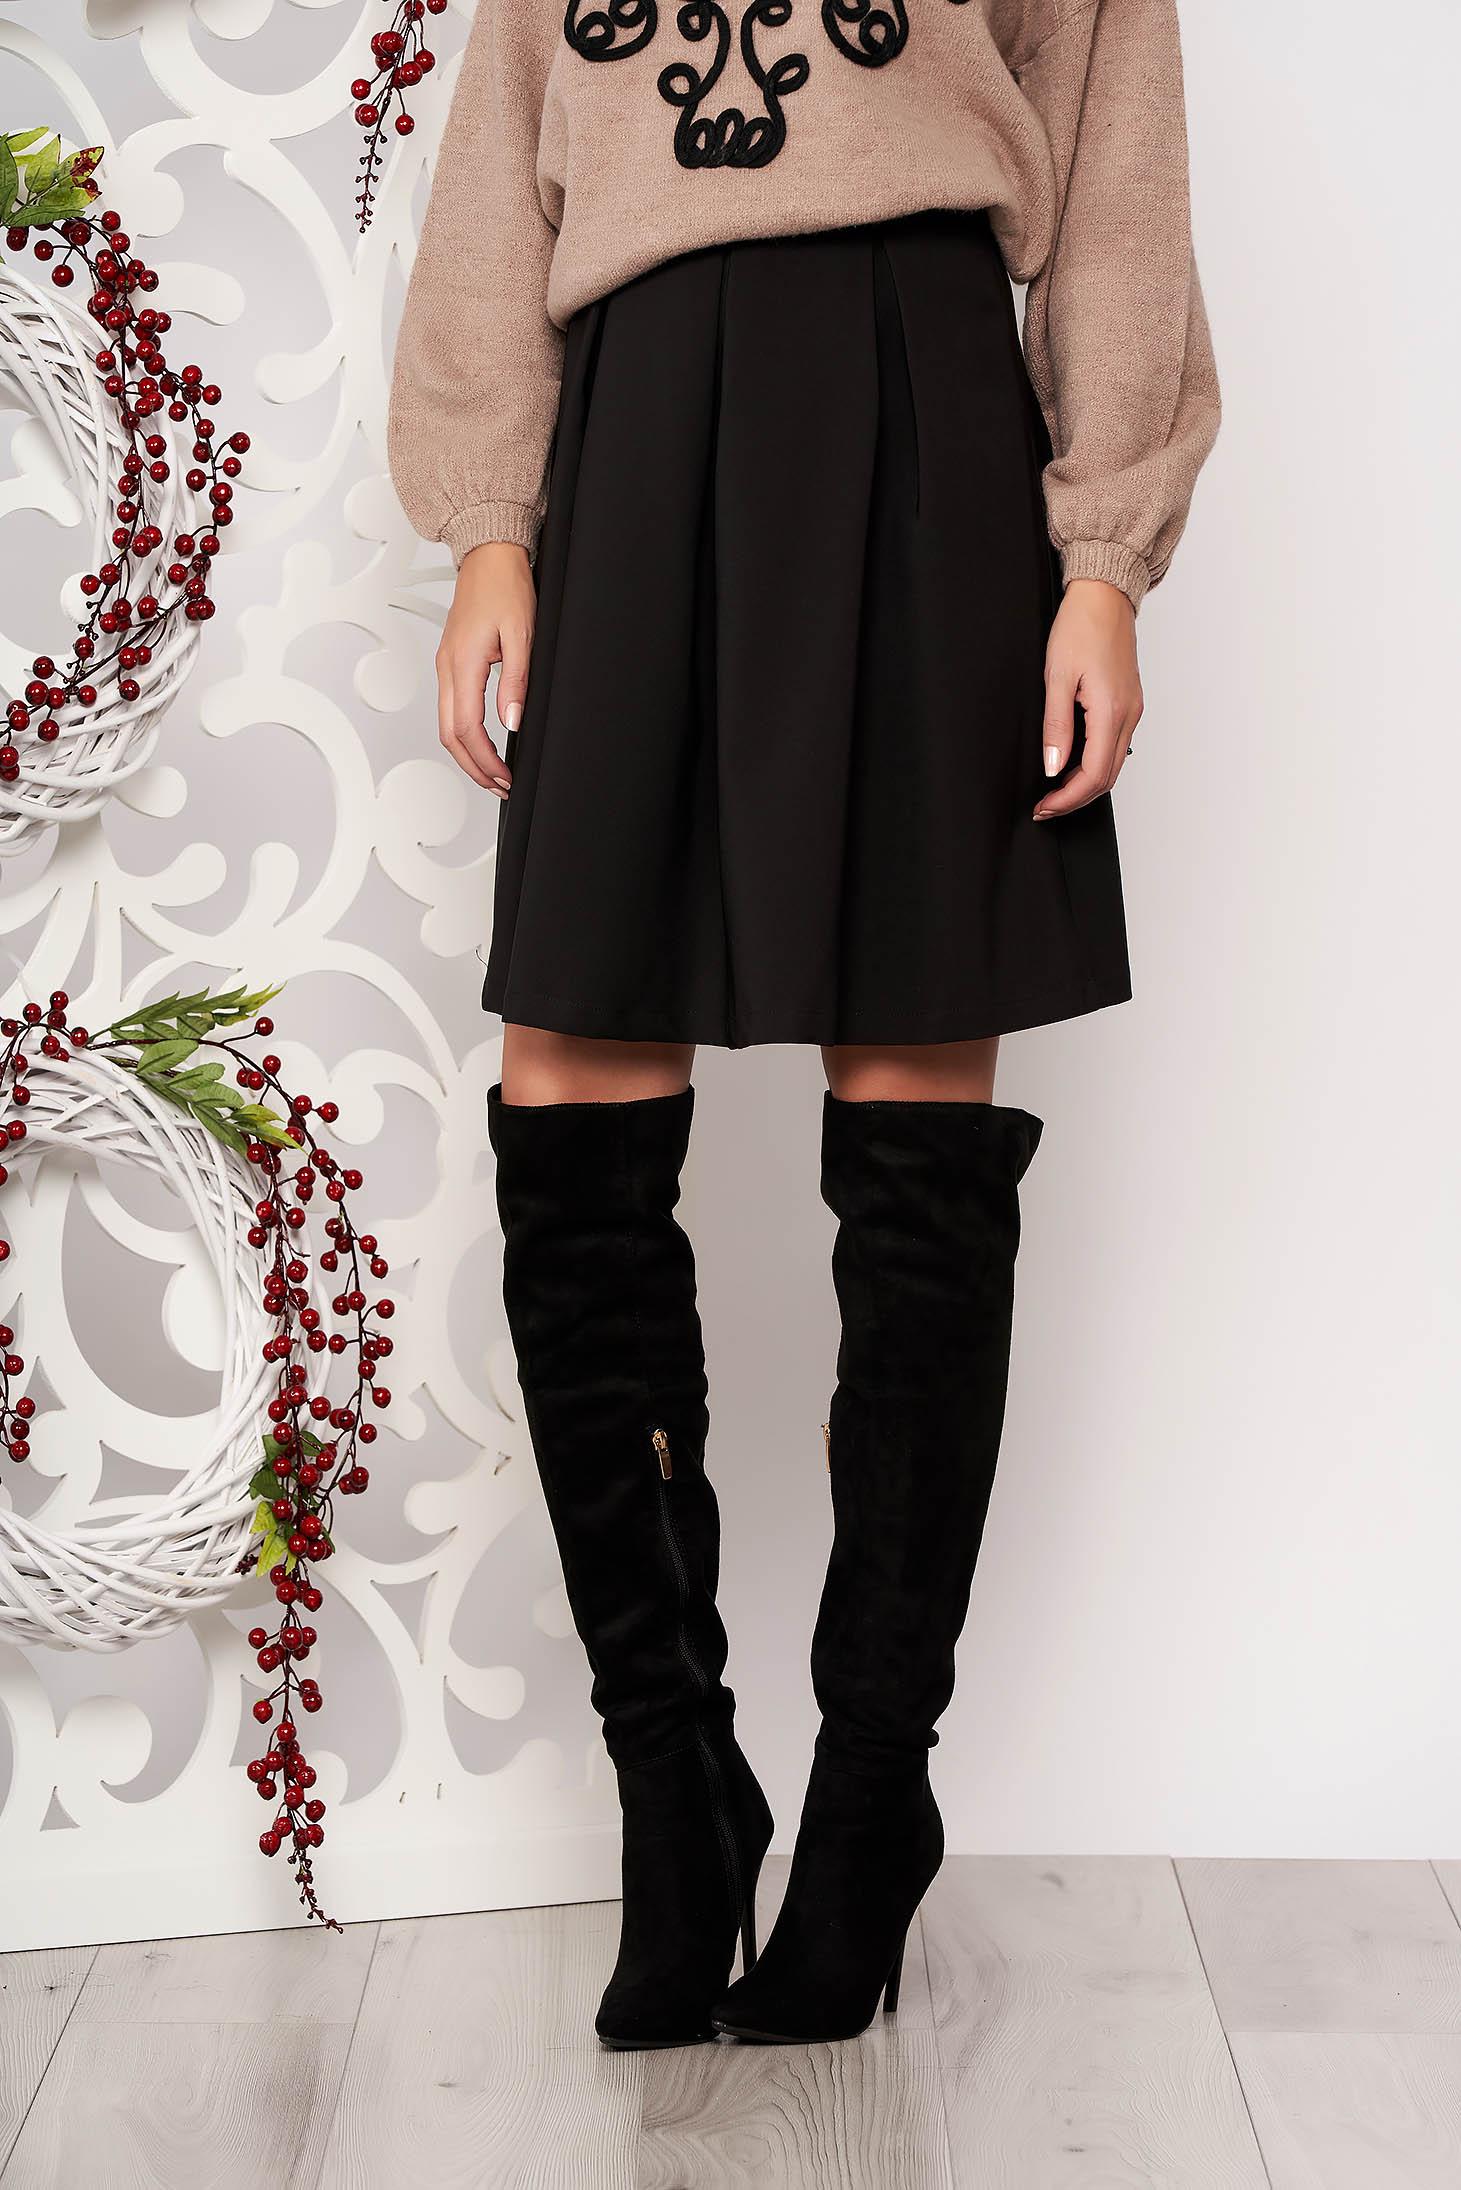 Black skirt office midi cloche slightly elastic fabric